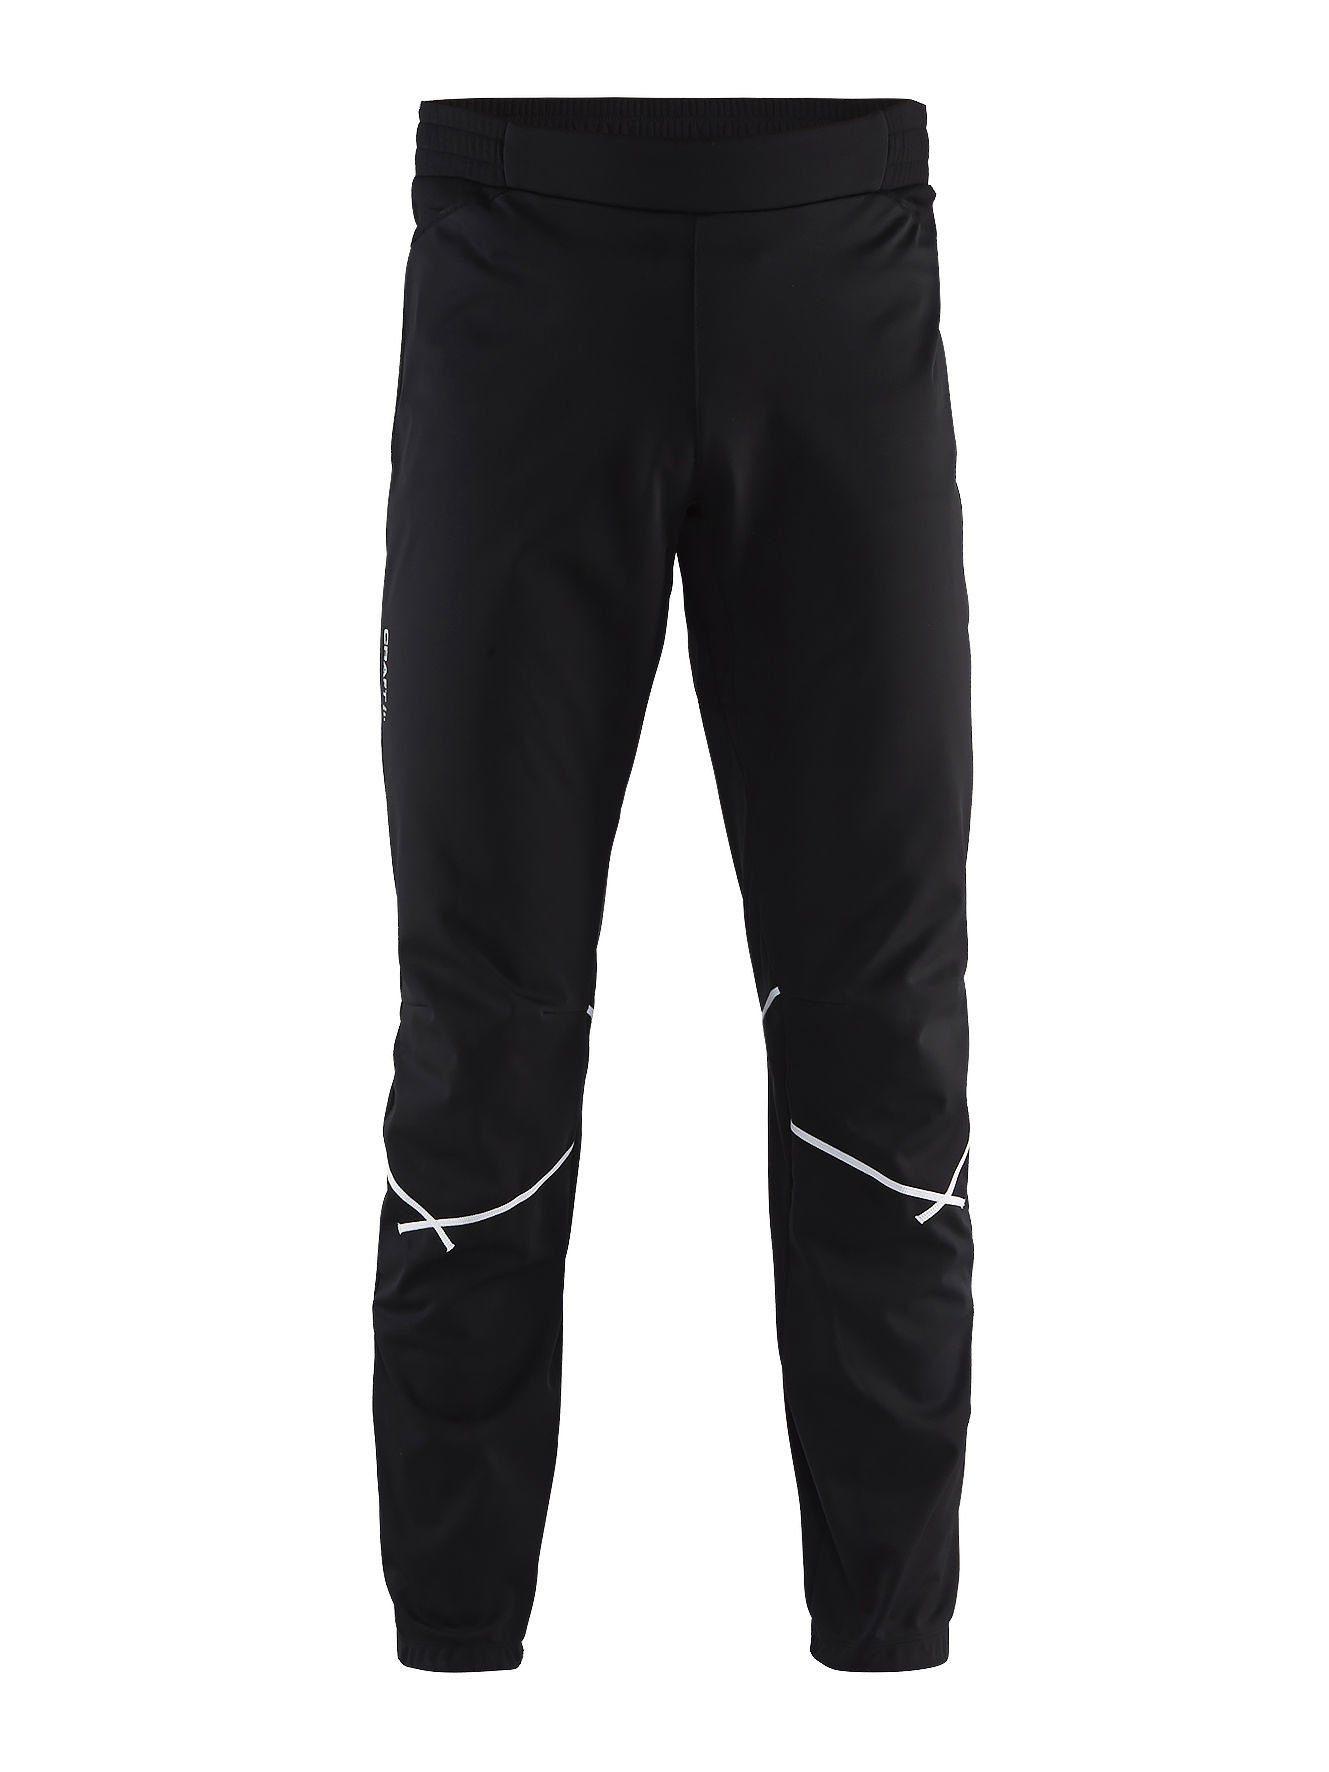 Craft Outdoorhose »Force Pants Men« online kaufen | OTTO